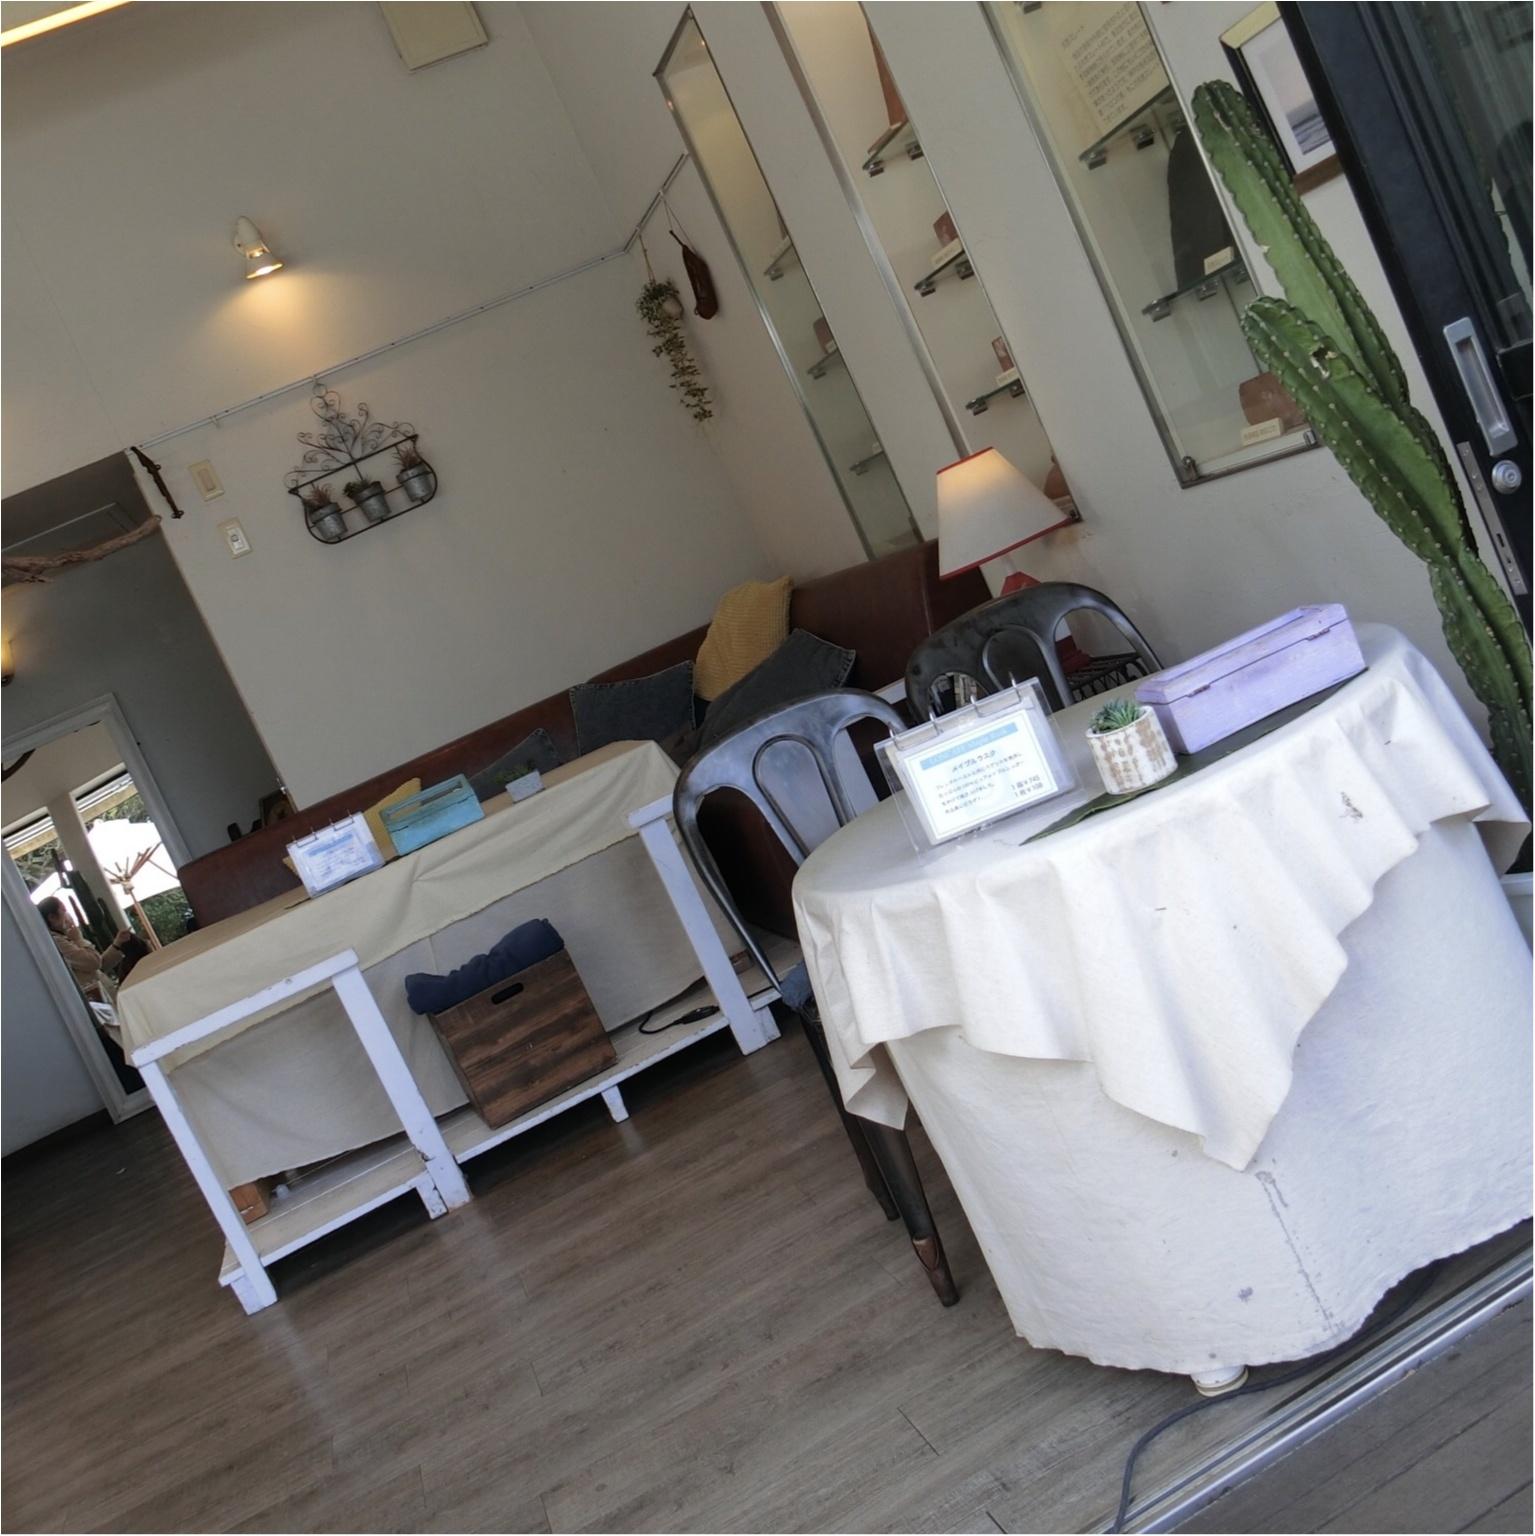 【LON CAFE②】フレンチトースト専門店〜江ノ島デート〜_2